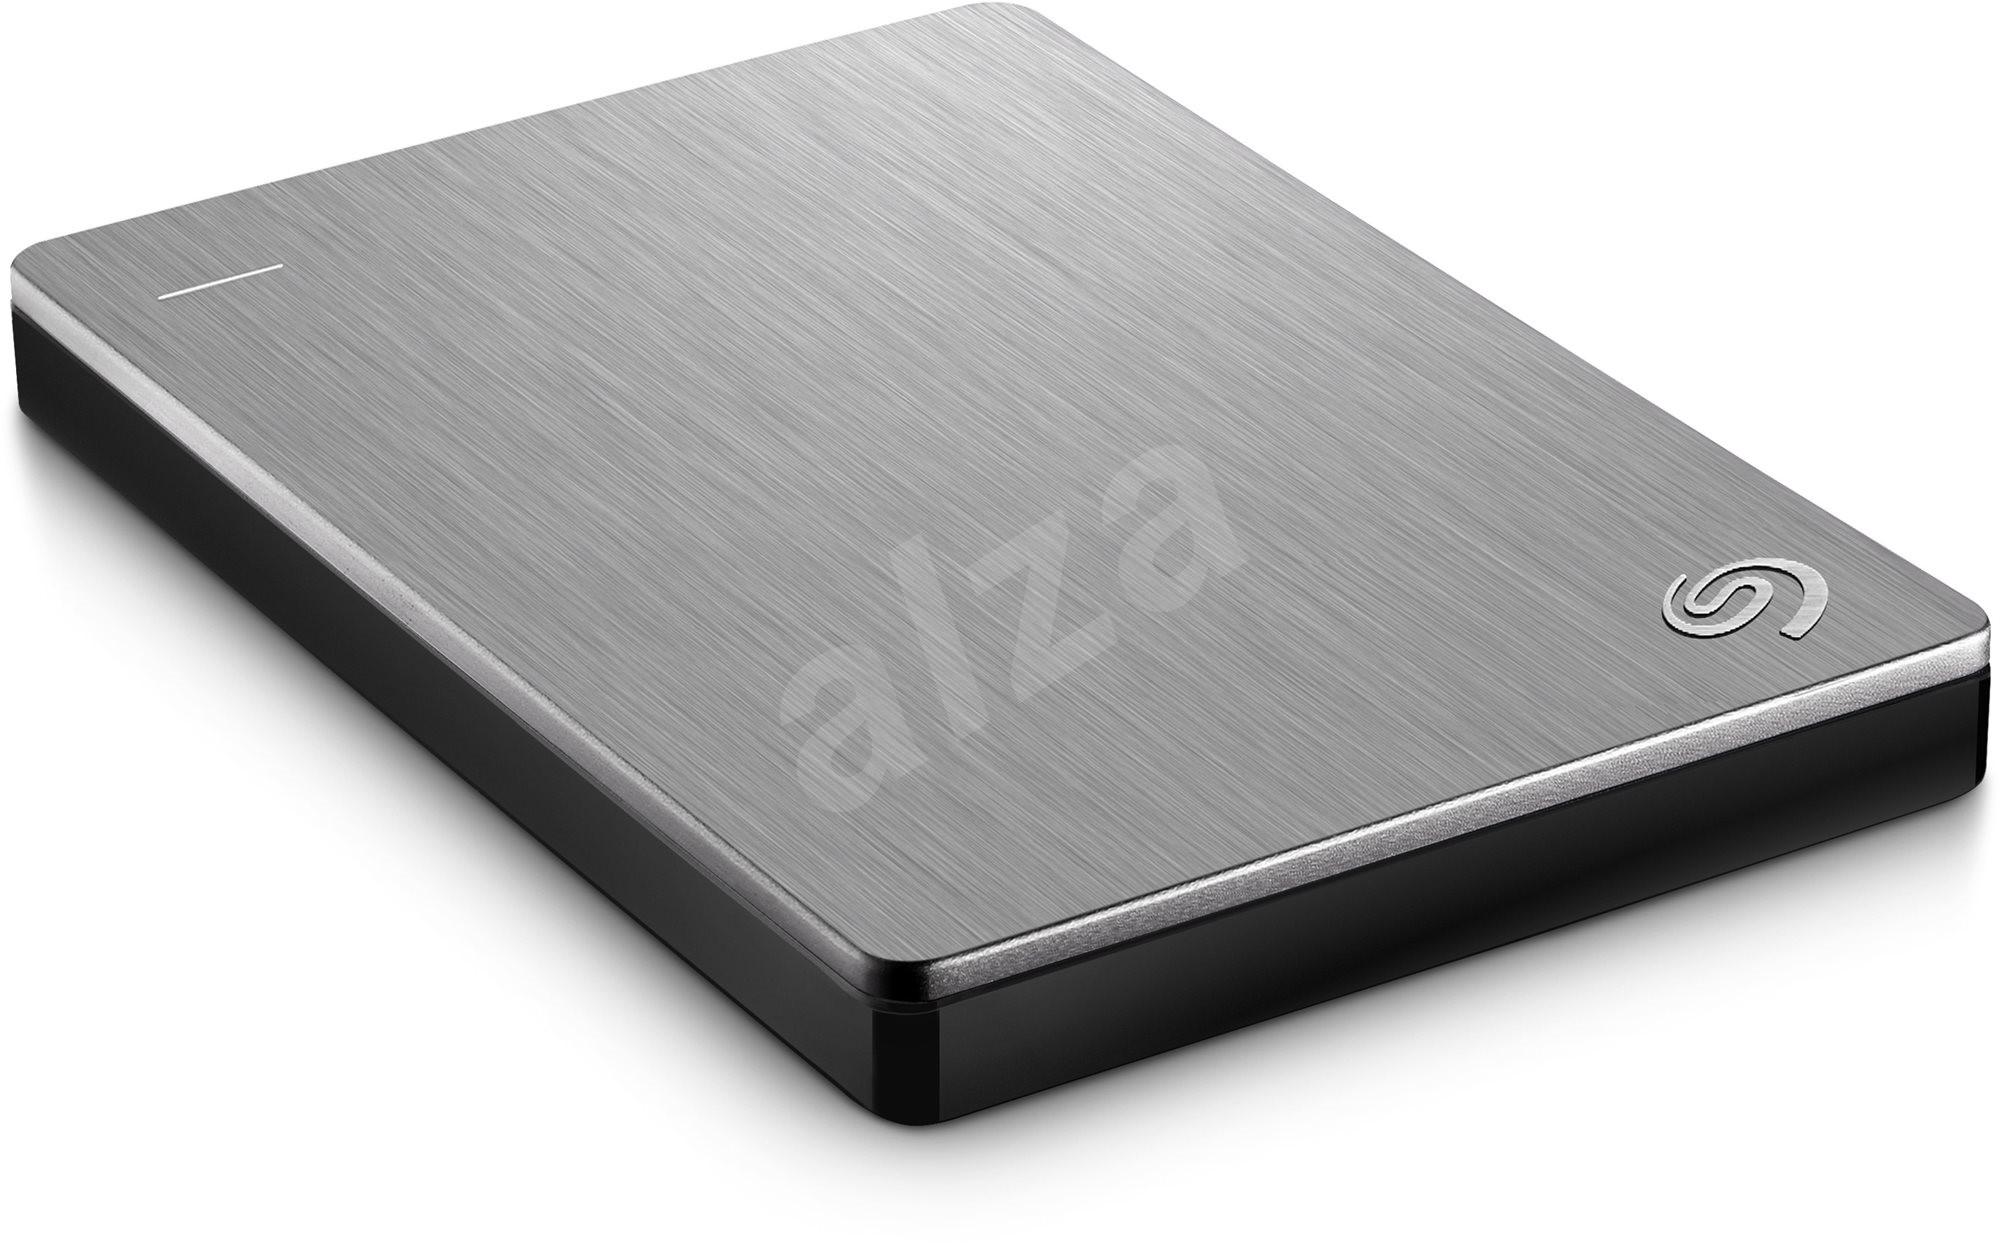 backup plus seagate flaches und portables 2tb silber. Black Bedroom Furniture Sets. Home Design Ideas